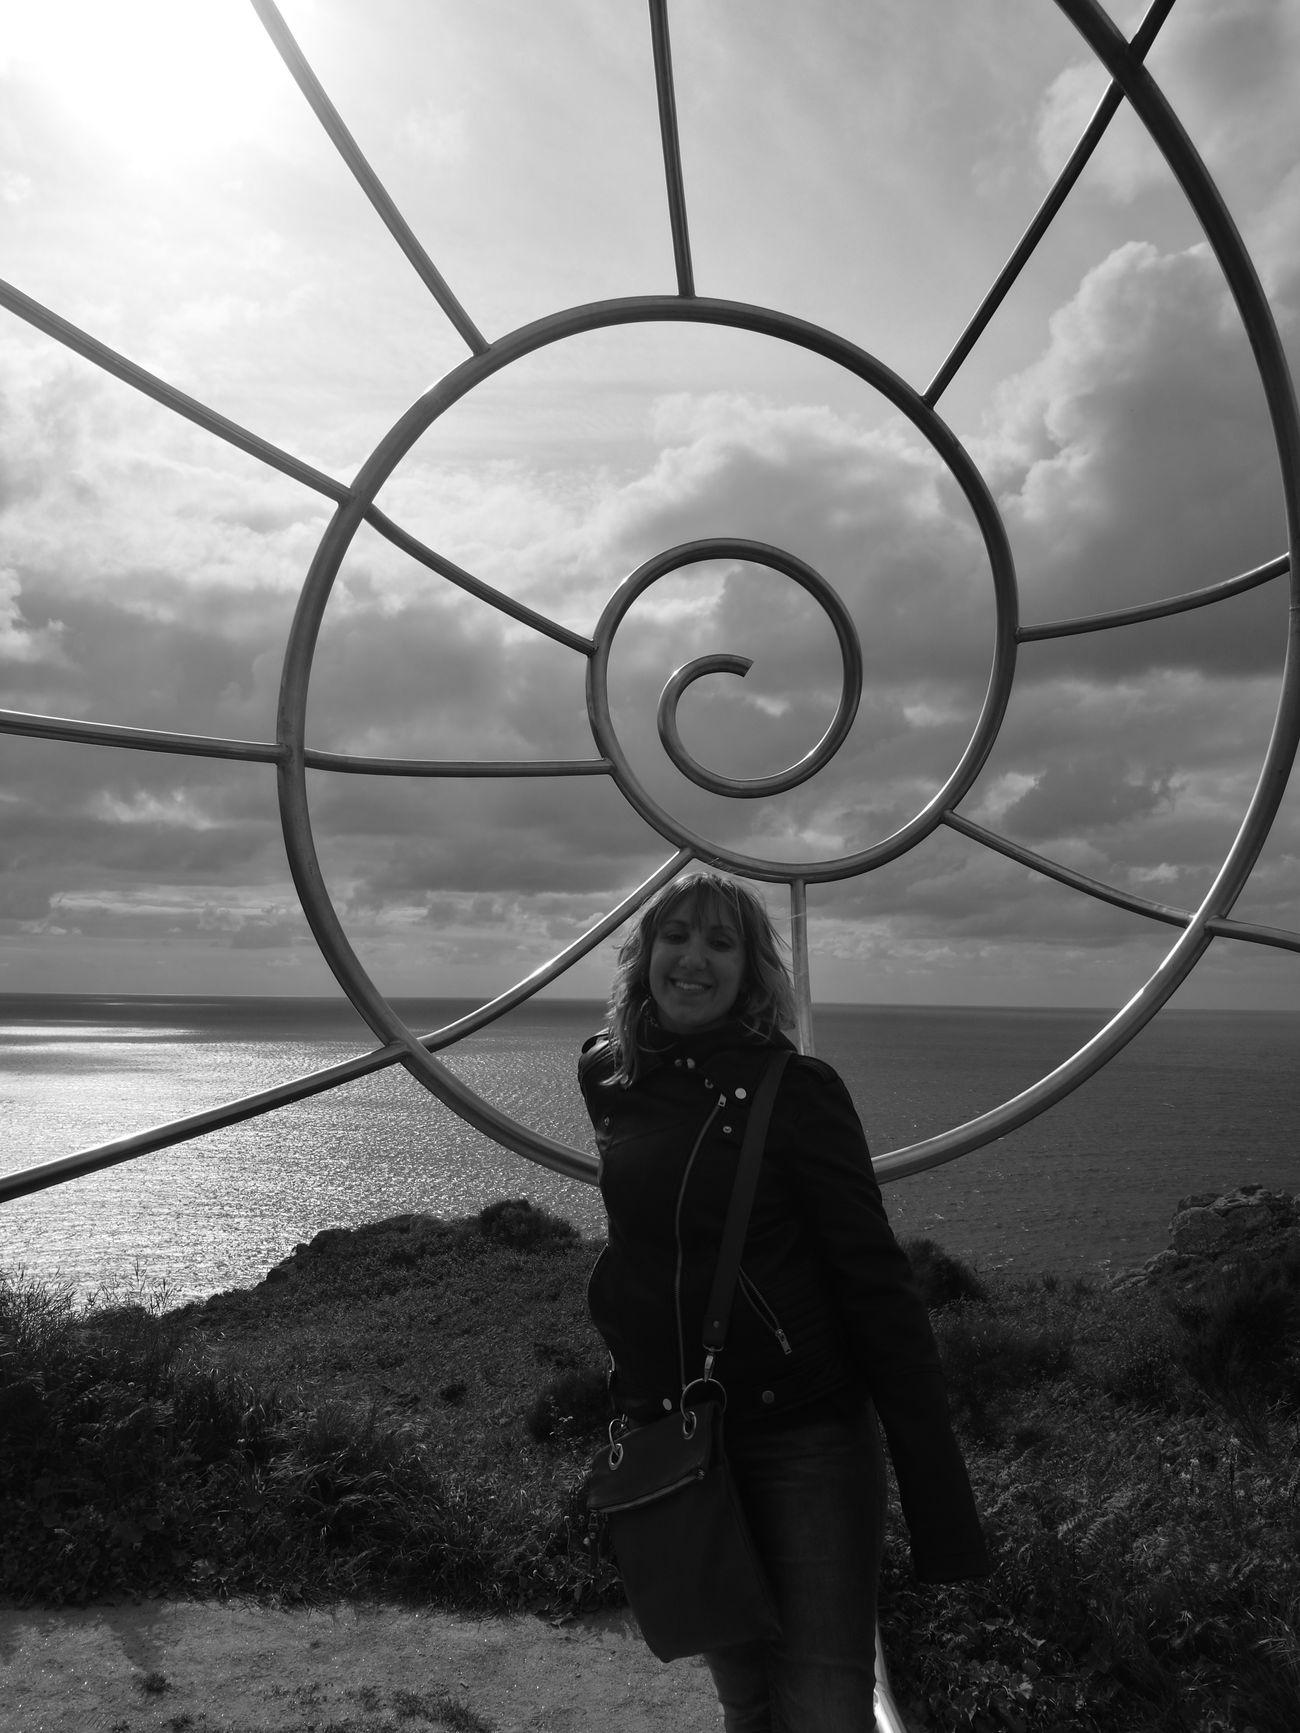 Outdoors Day Blackandwhite HuaweiP9 Woman Cabo Home Cangas Do Morrazo, Pontevedra Shell